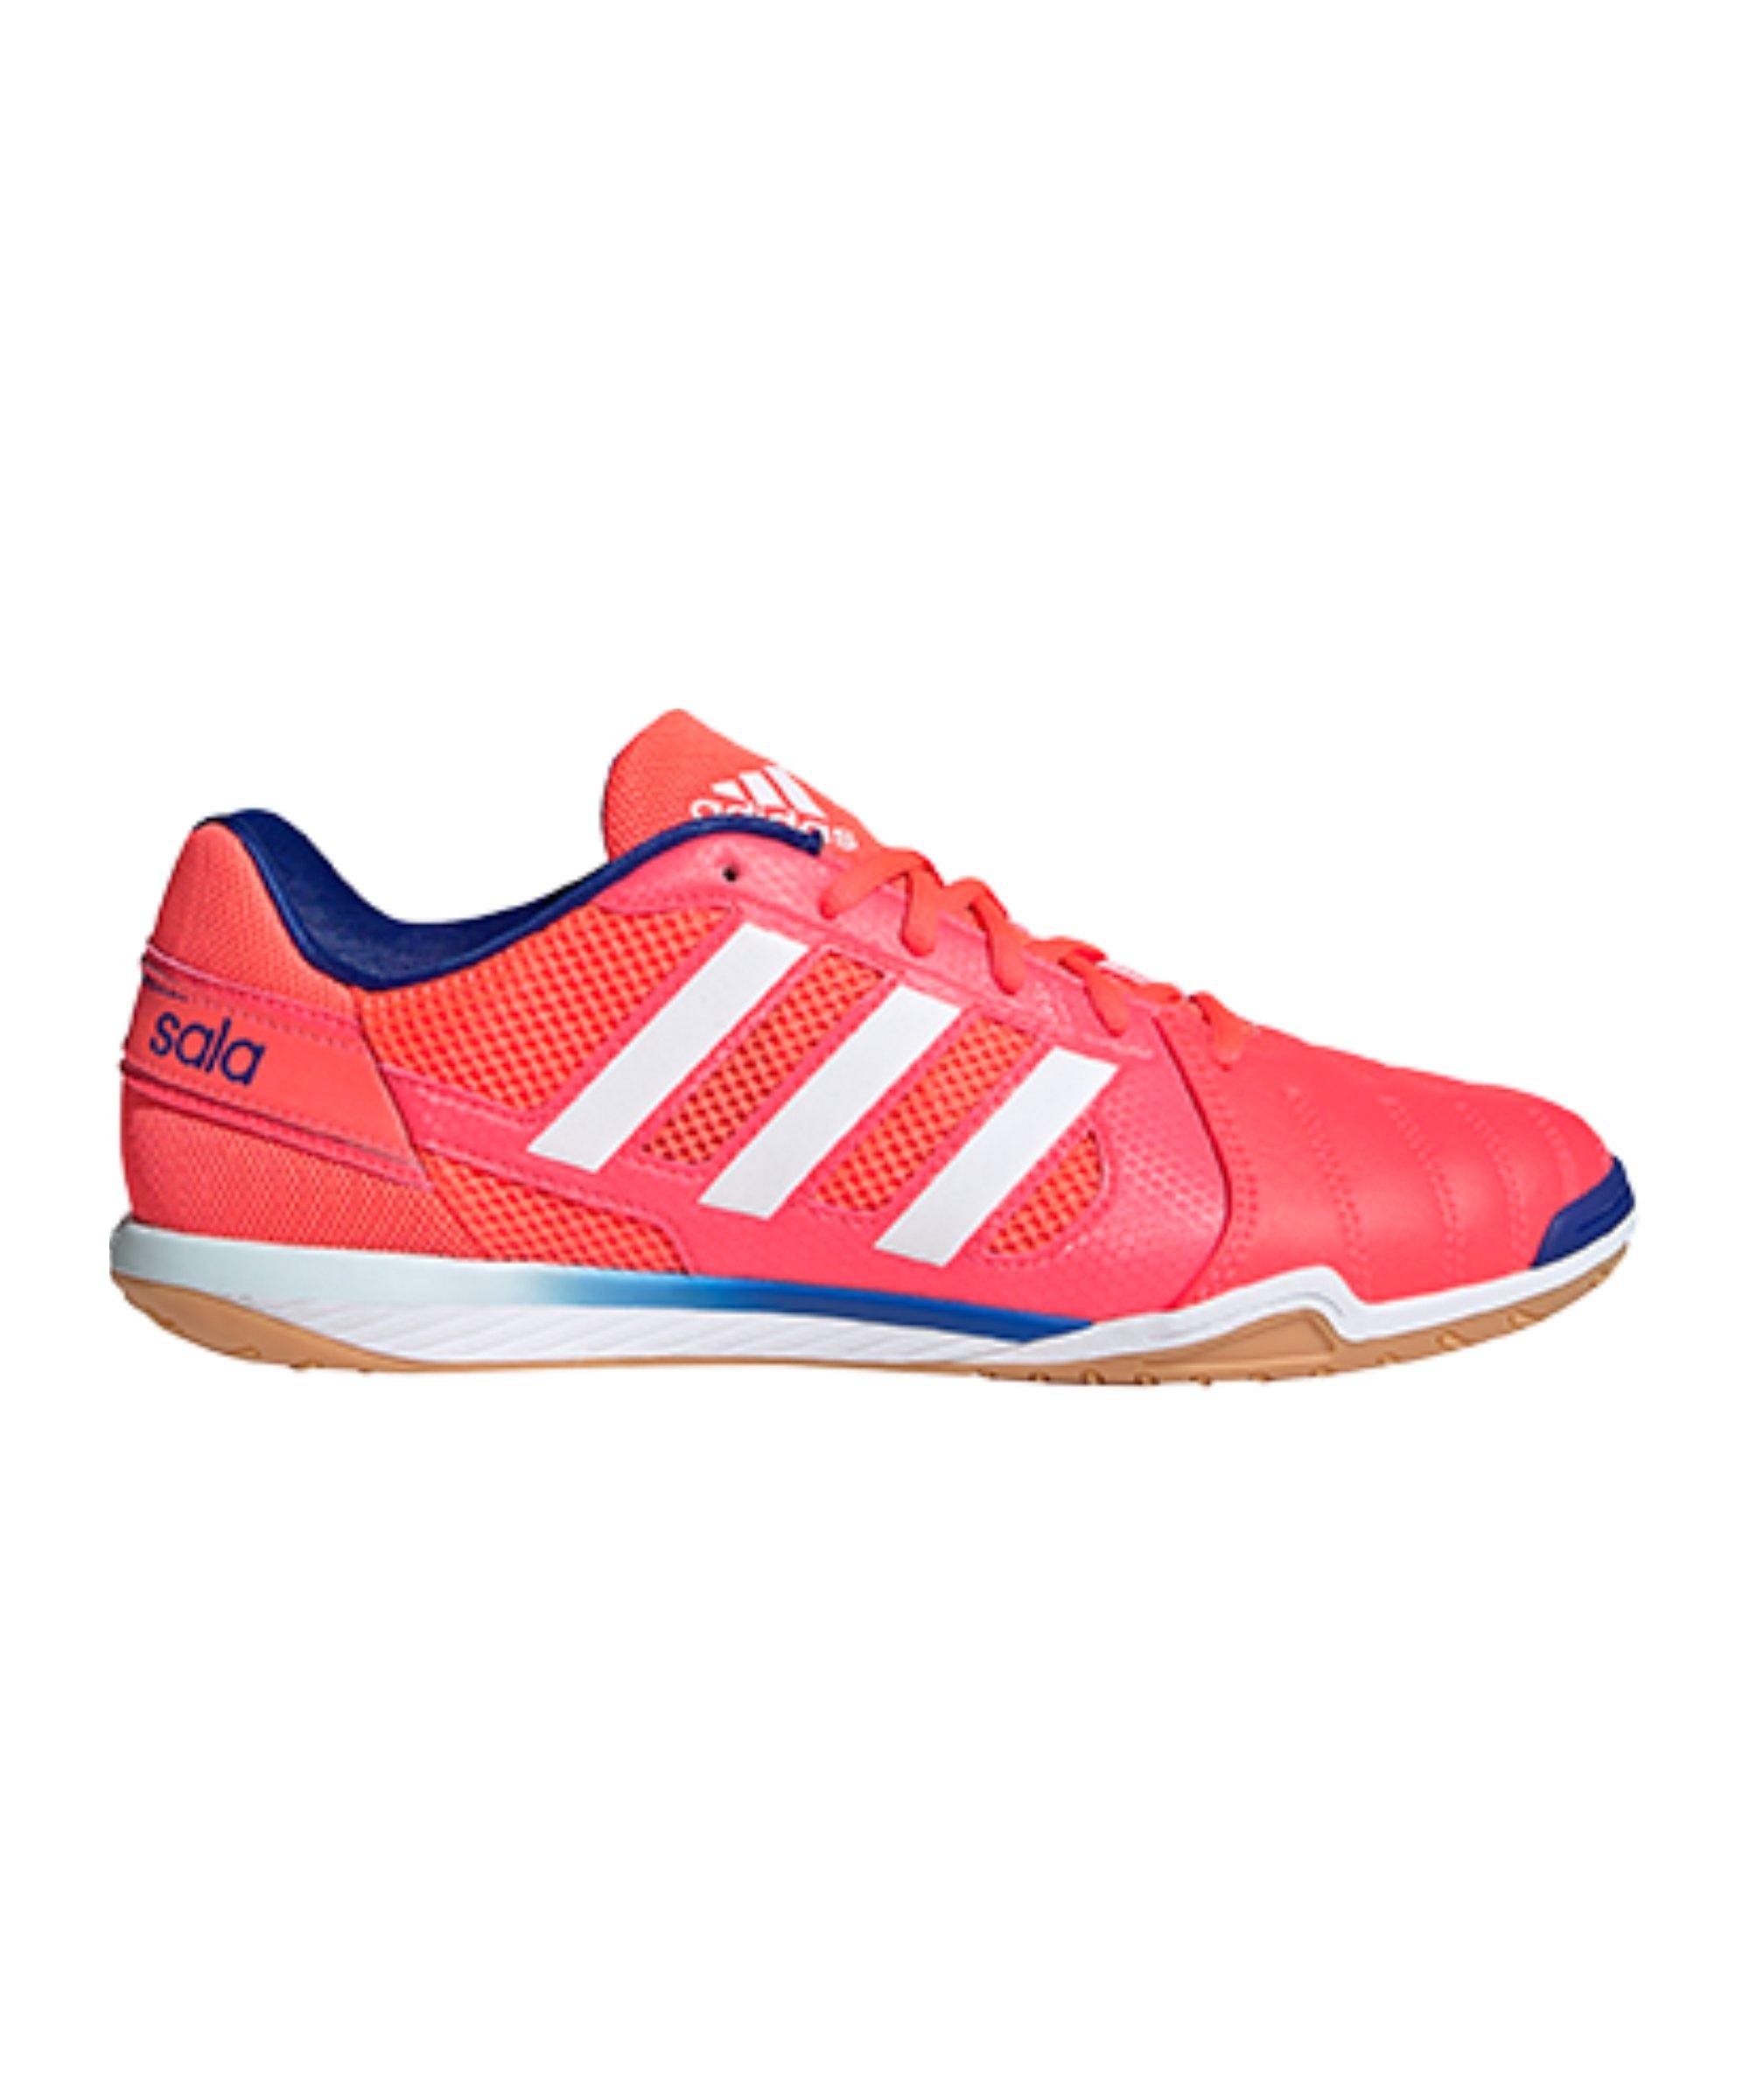 adidas Top Sala IN Halle Pink Blau Weiss - pink